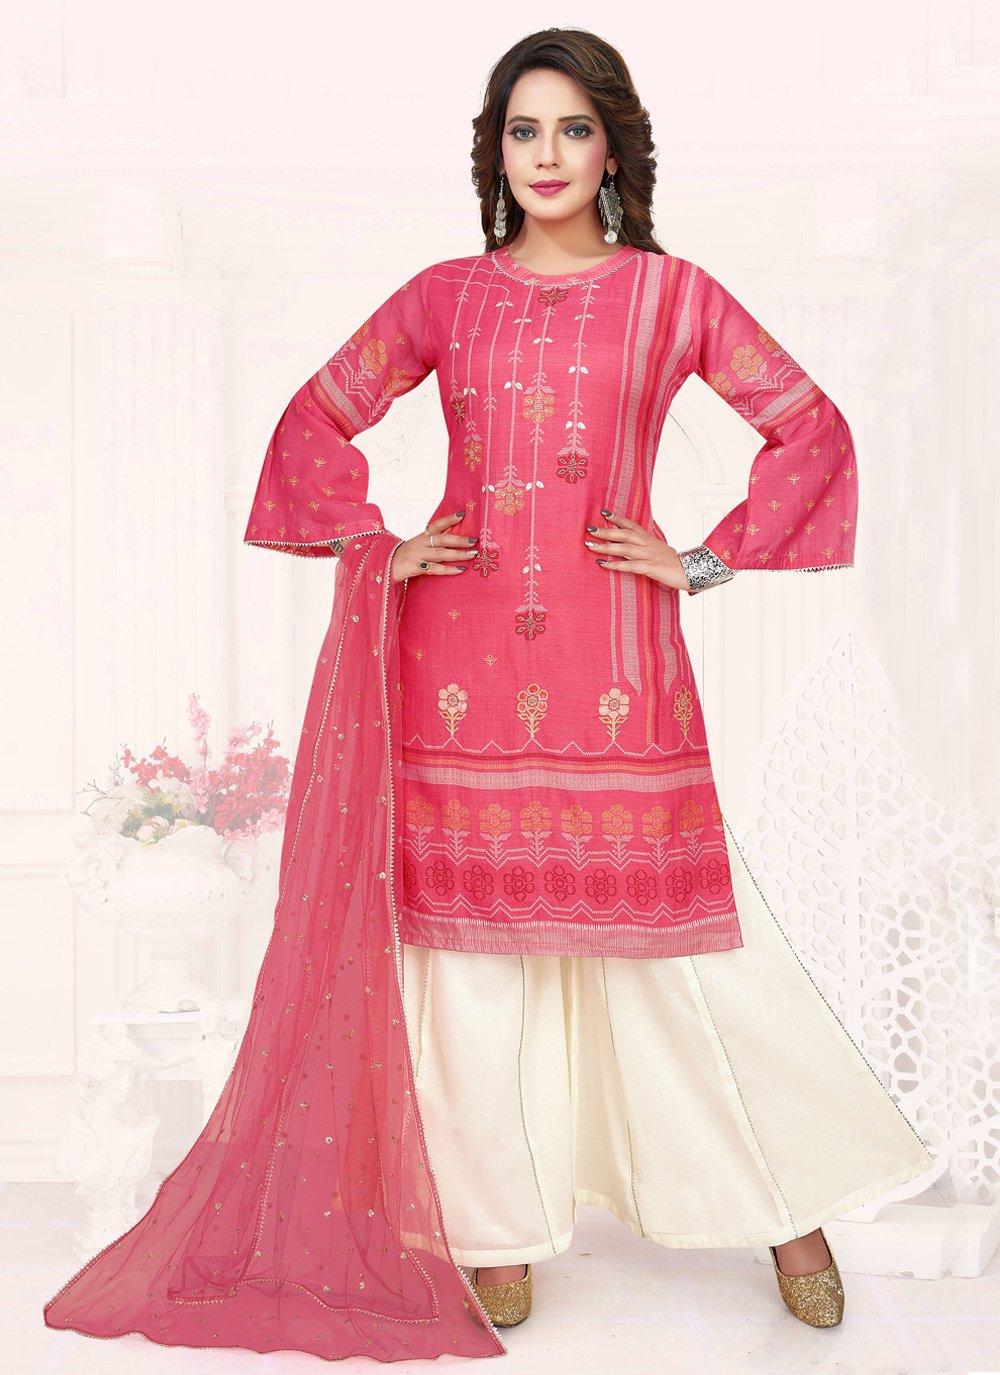 Cotton Embroidered Pink Trendy Salwar Kameez